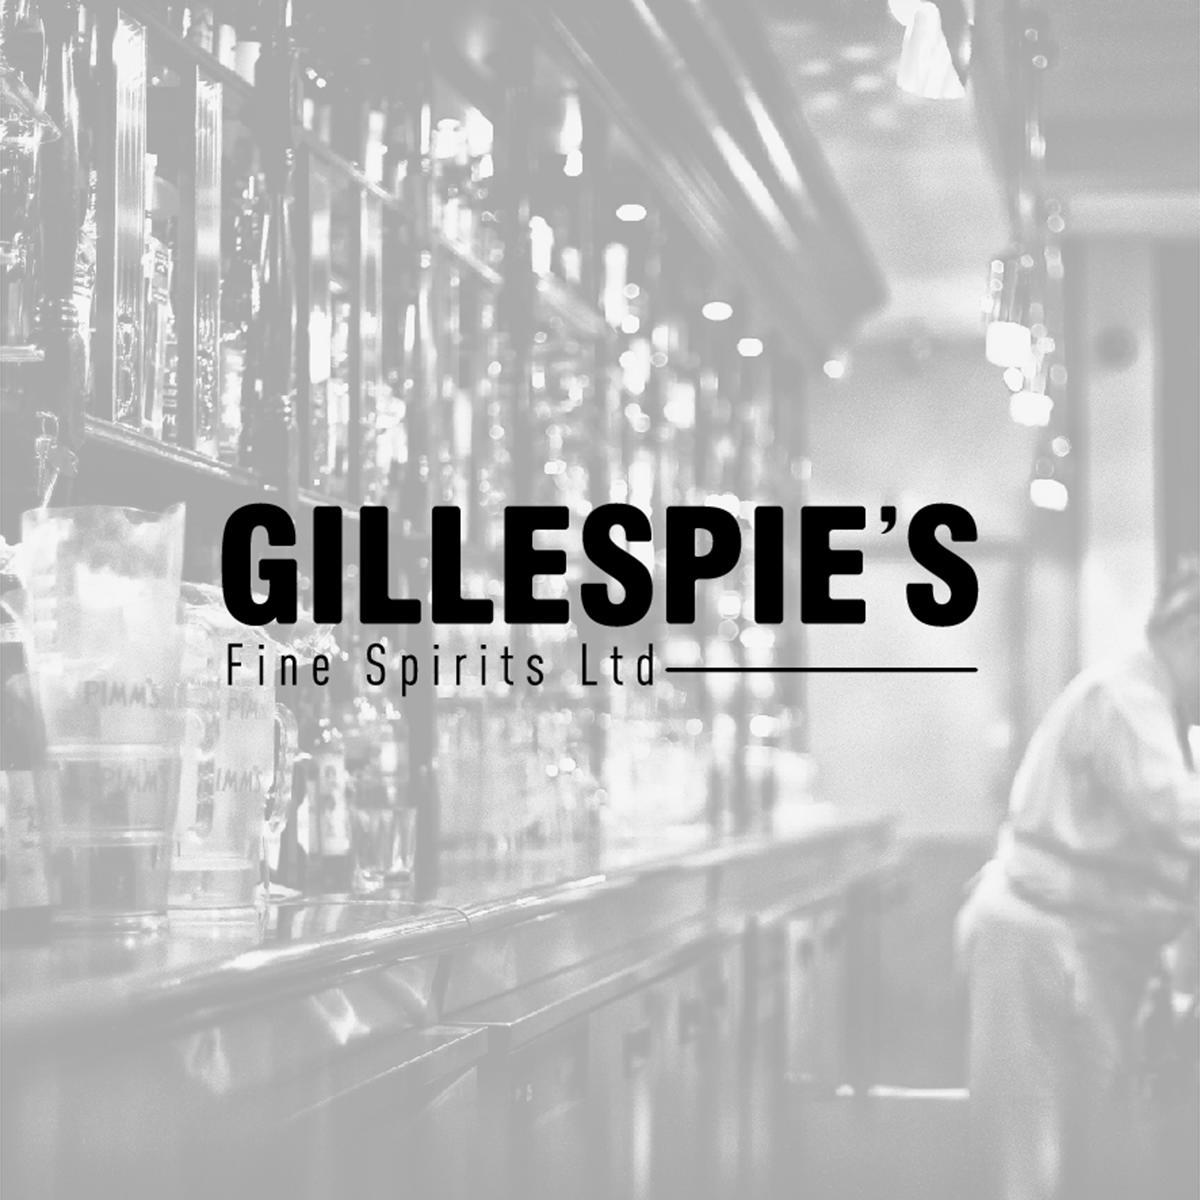 #MarketMonday vendor Gillespie's Artisan Craft Distillery